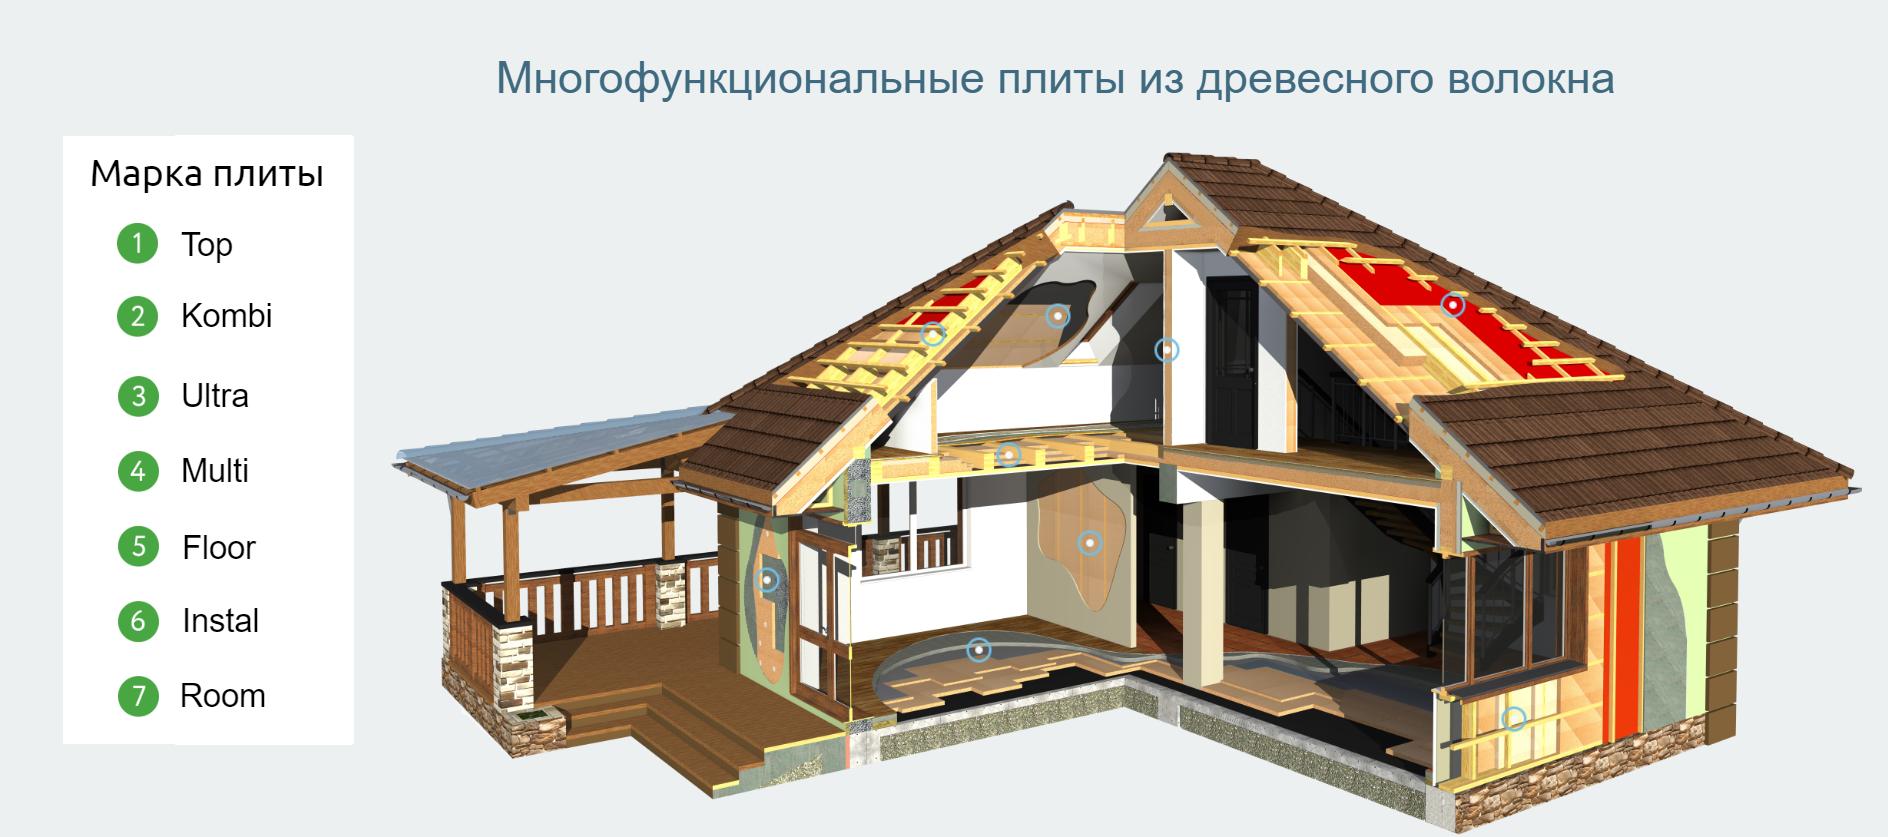 https://www.e-t1.ru/images/upload/2019-10-03_14-54-46.png